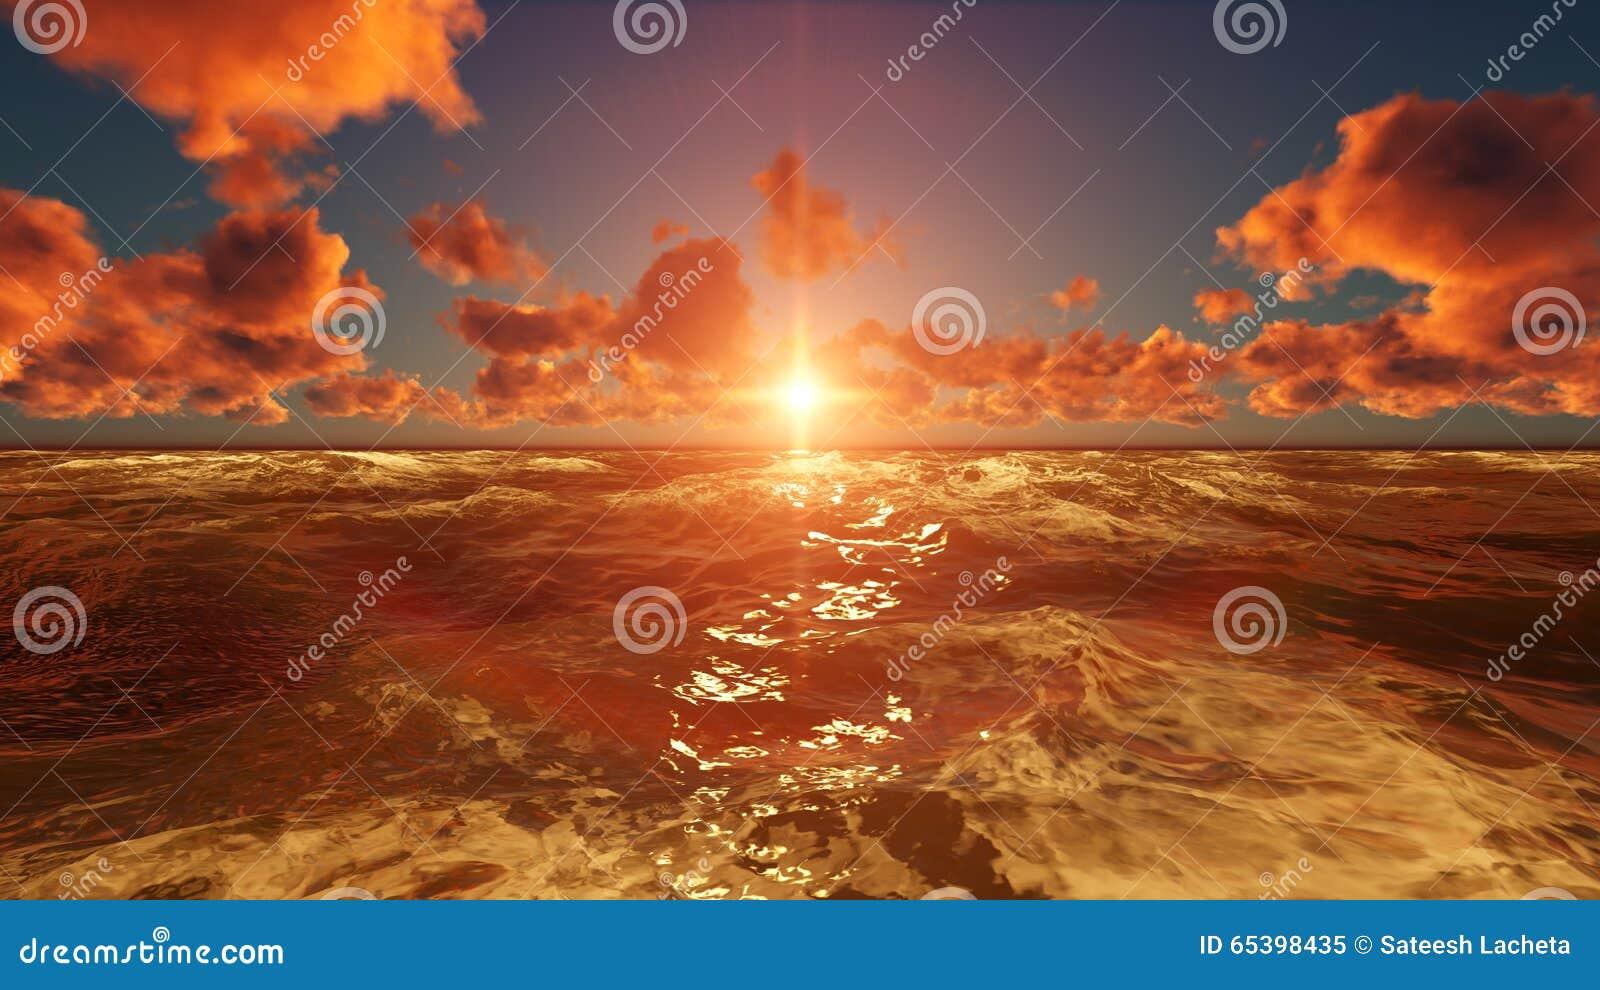 Natur-Sonnenuntergang-Szenen-Licht-Reflexion im Ozean